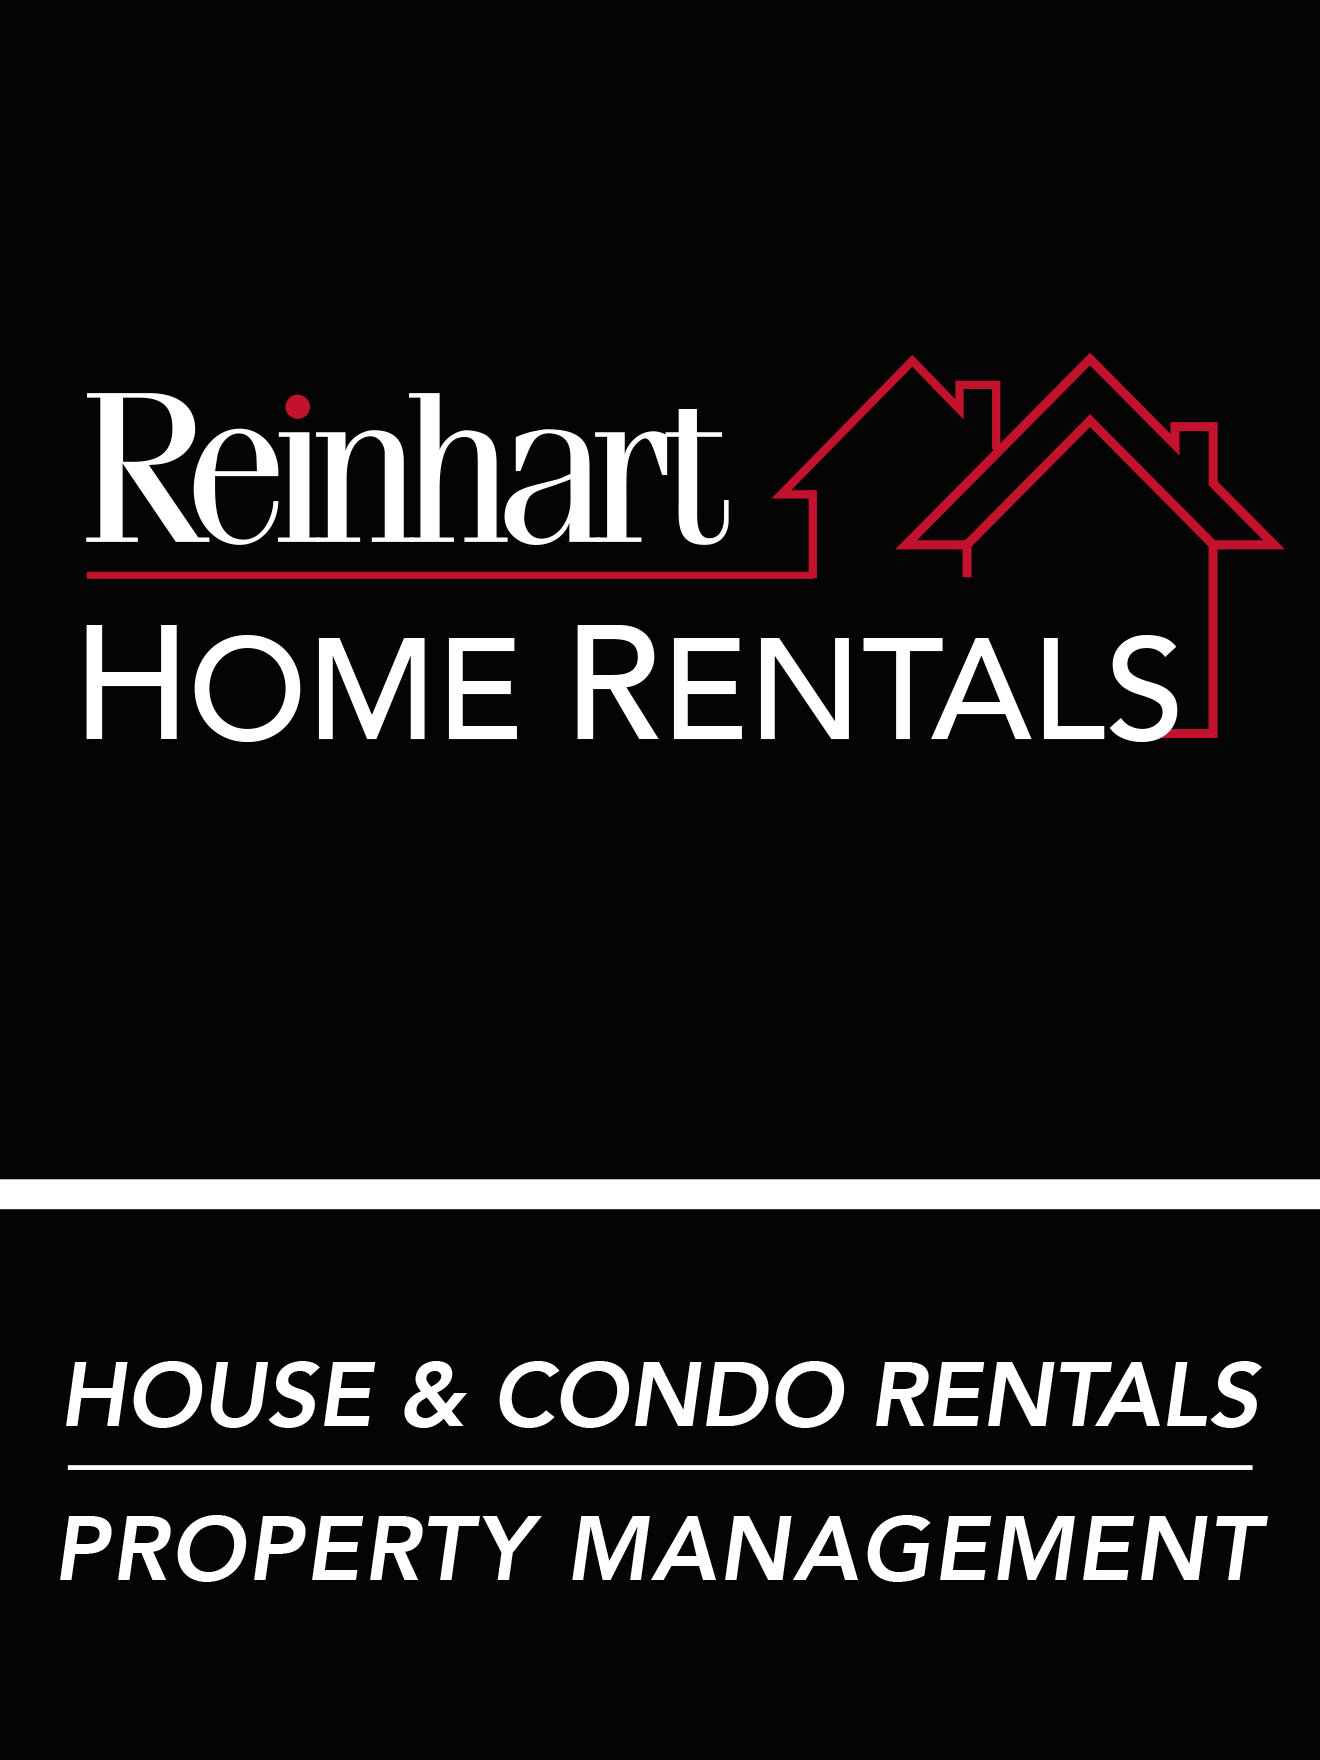 Property Management Real Estate Agents